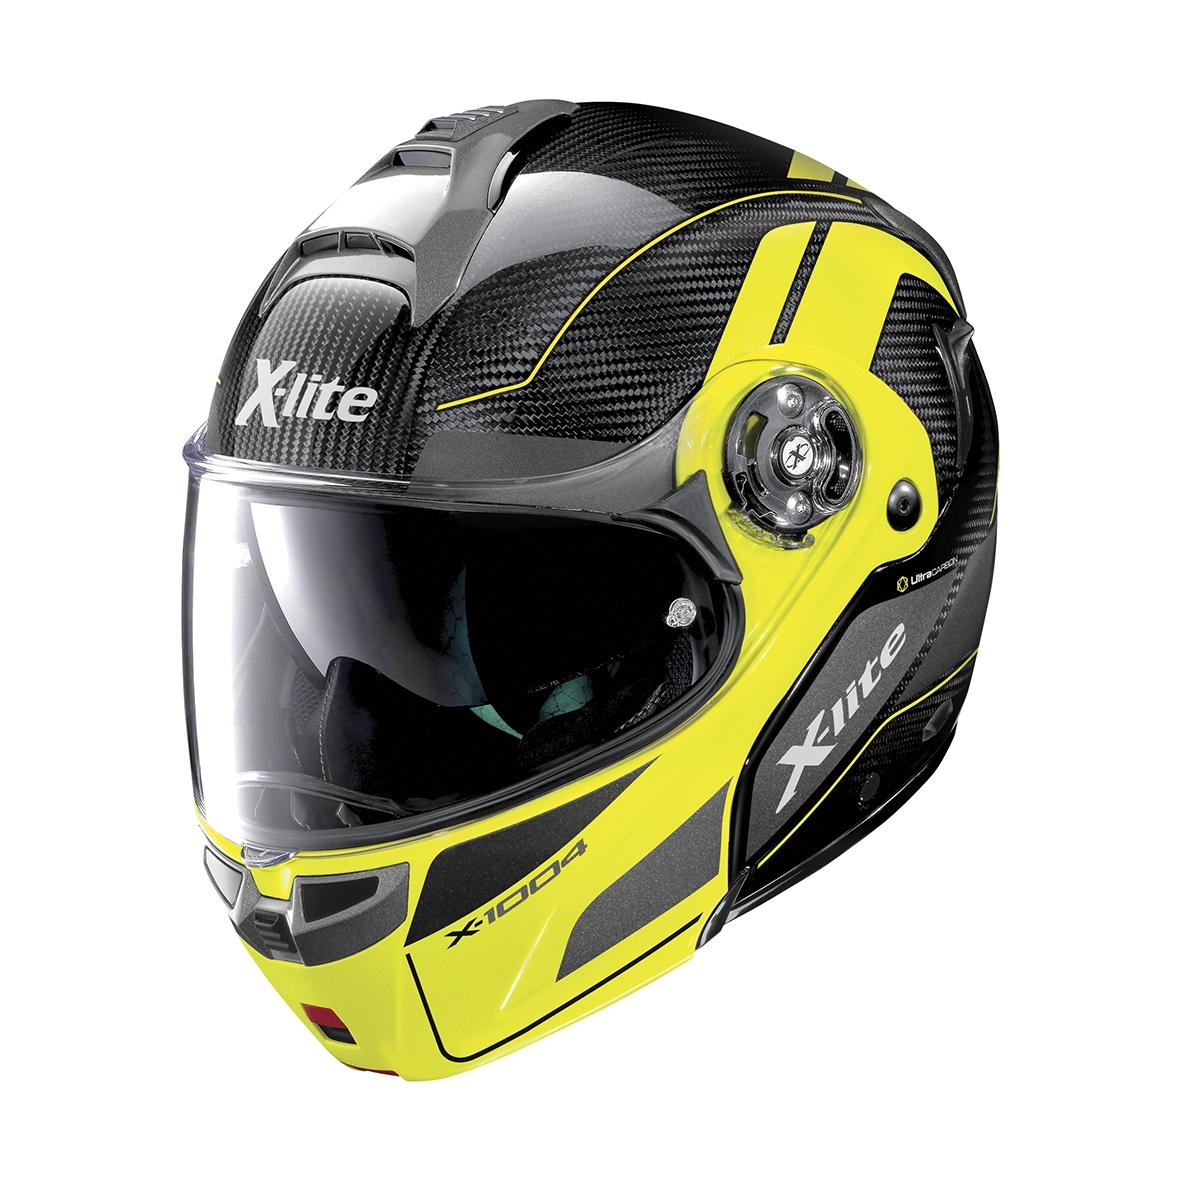 Moto helma X-Lite X-1004 Ultra Carbon Charismatic N-Com Led Yellow Chin Guard 14